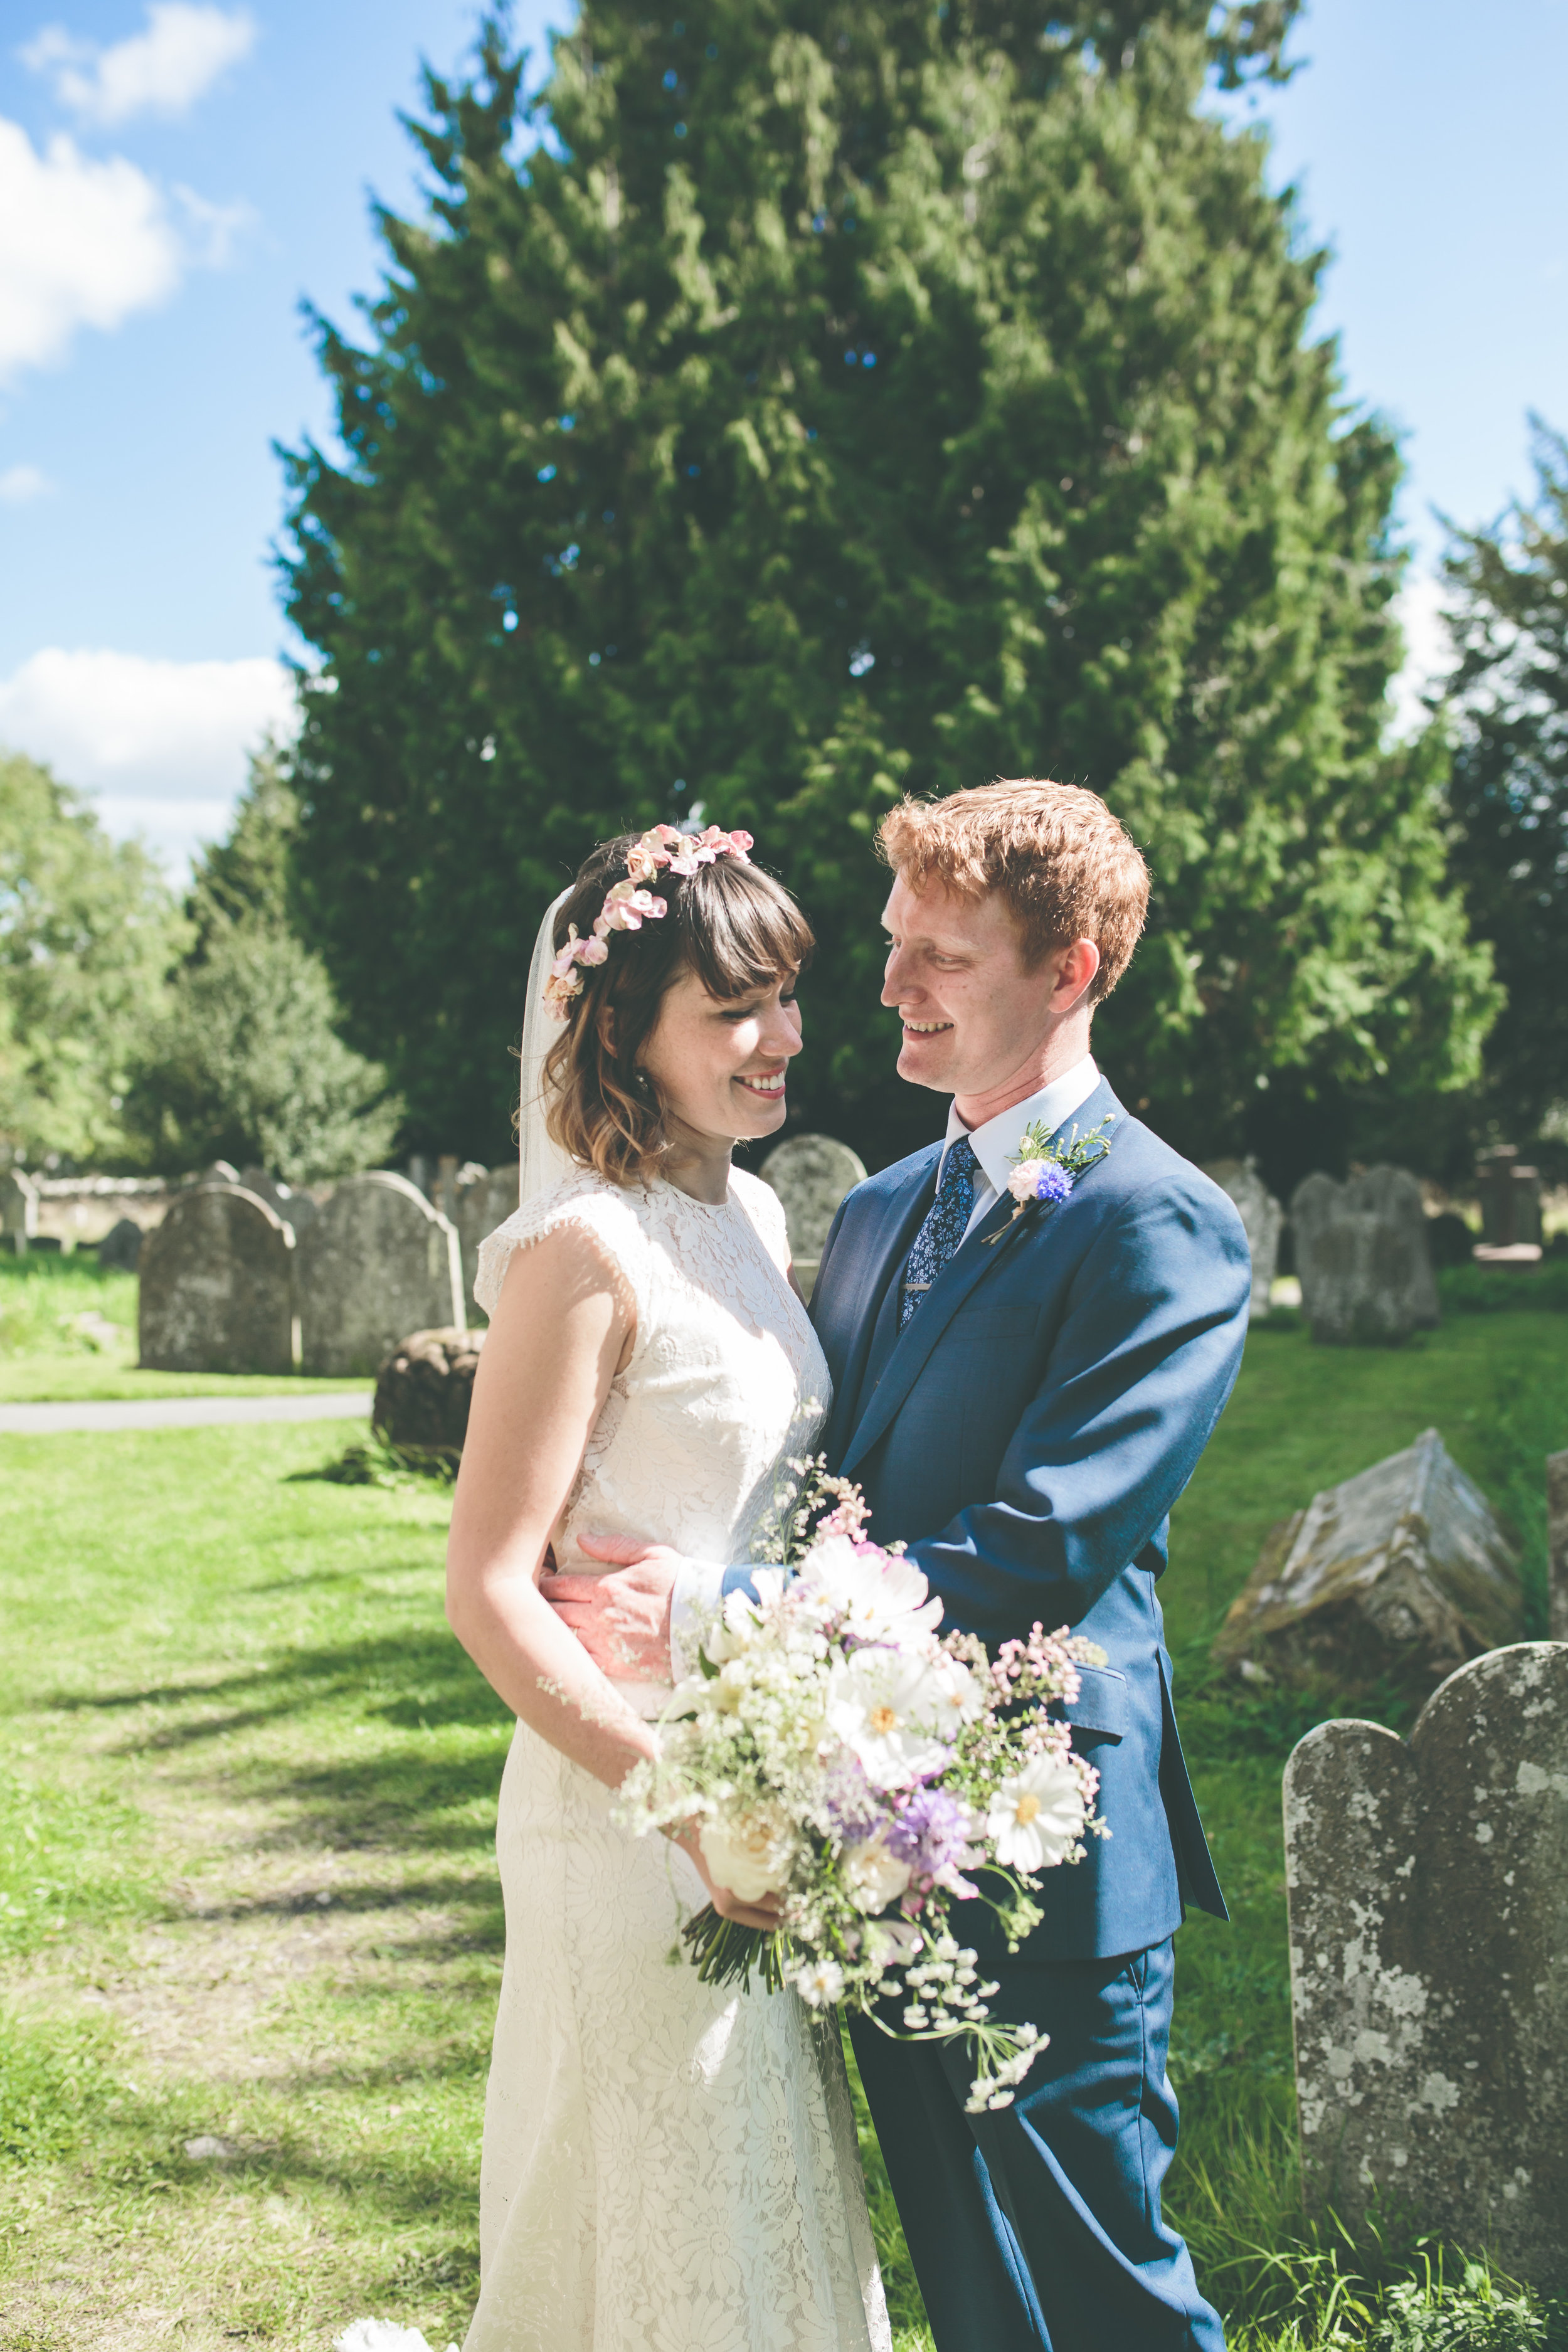 Walcot_Hall_Wedding_Photography_Jesse_Rose_-209.jpg